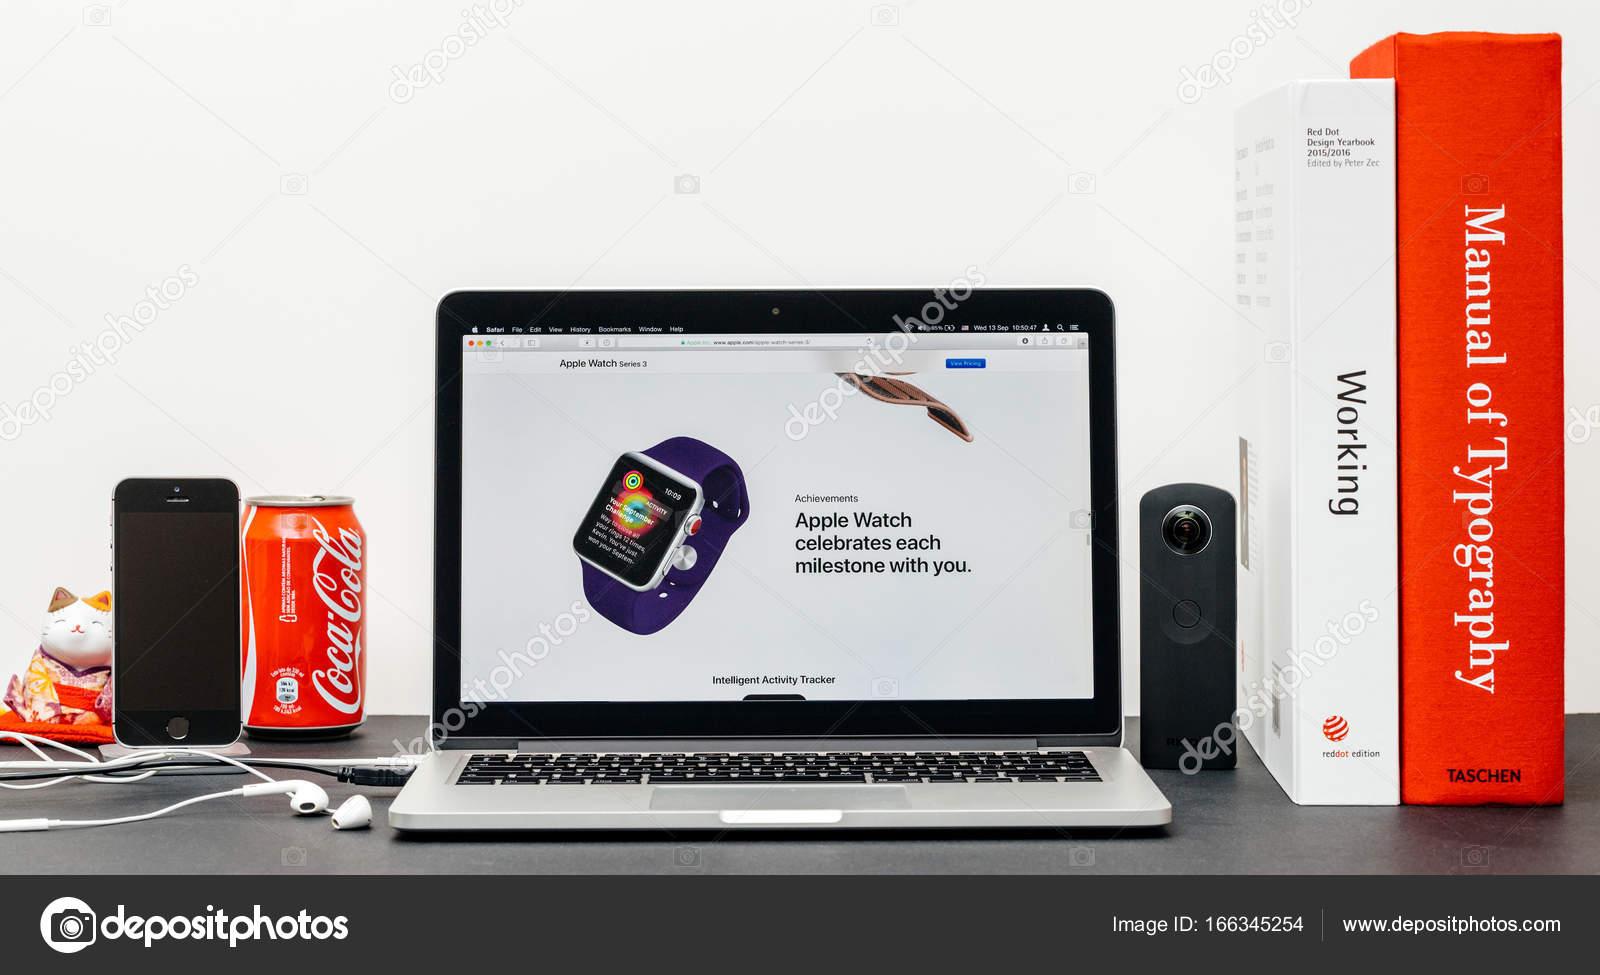 Latest Apple Watch Series 3 with Achievements milestones app